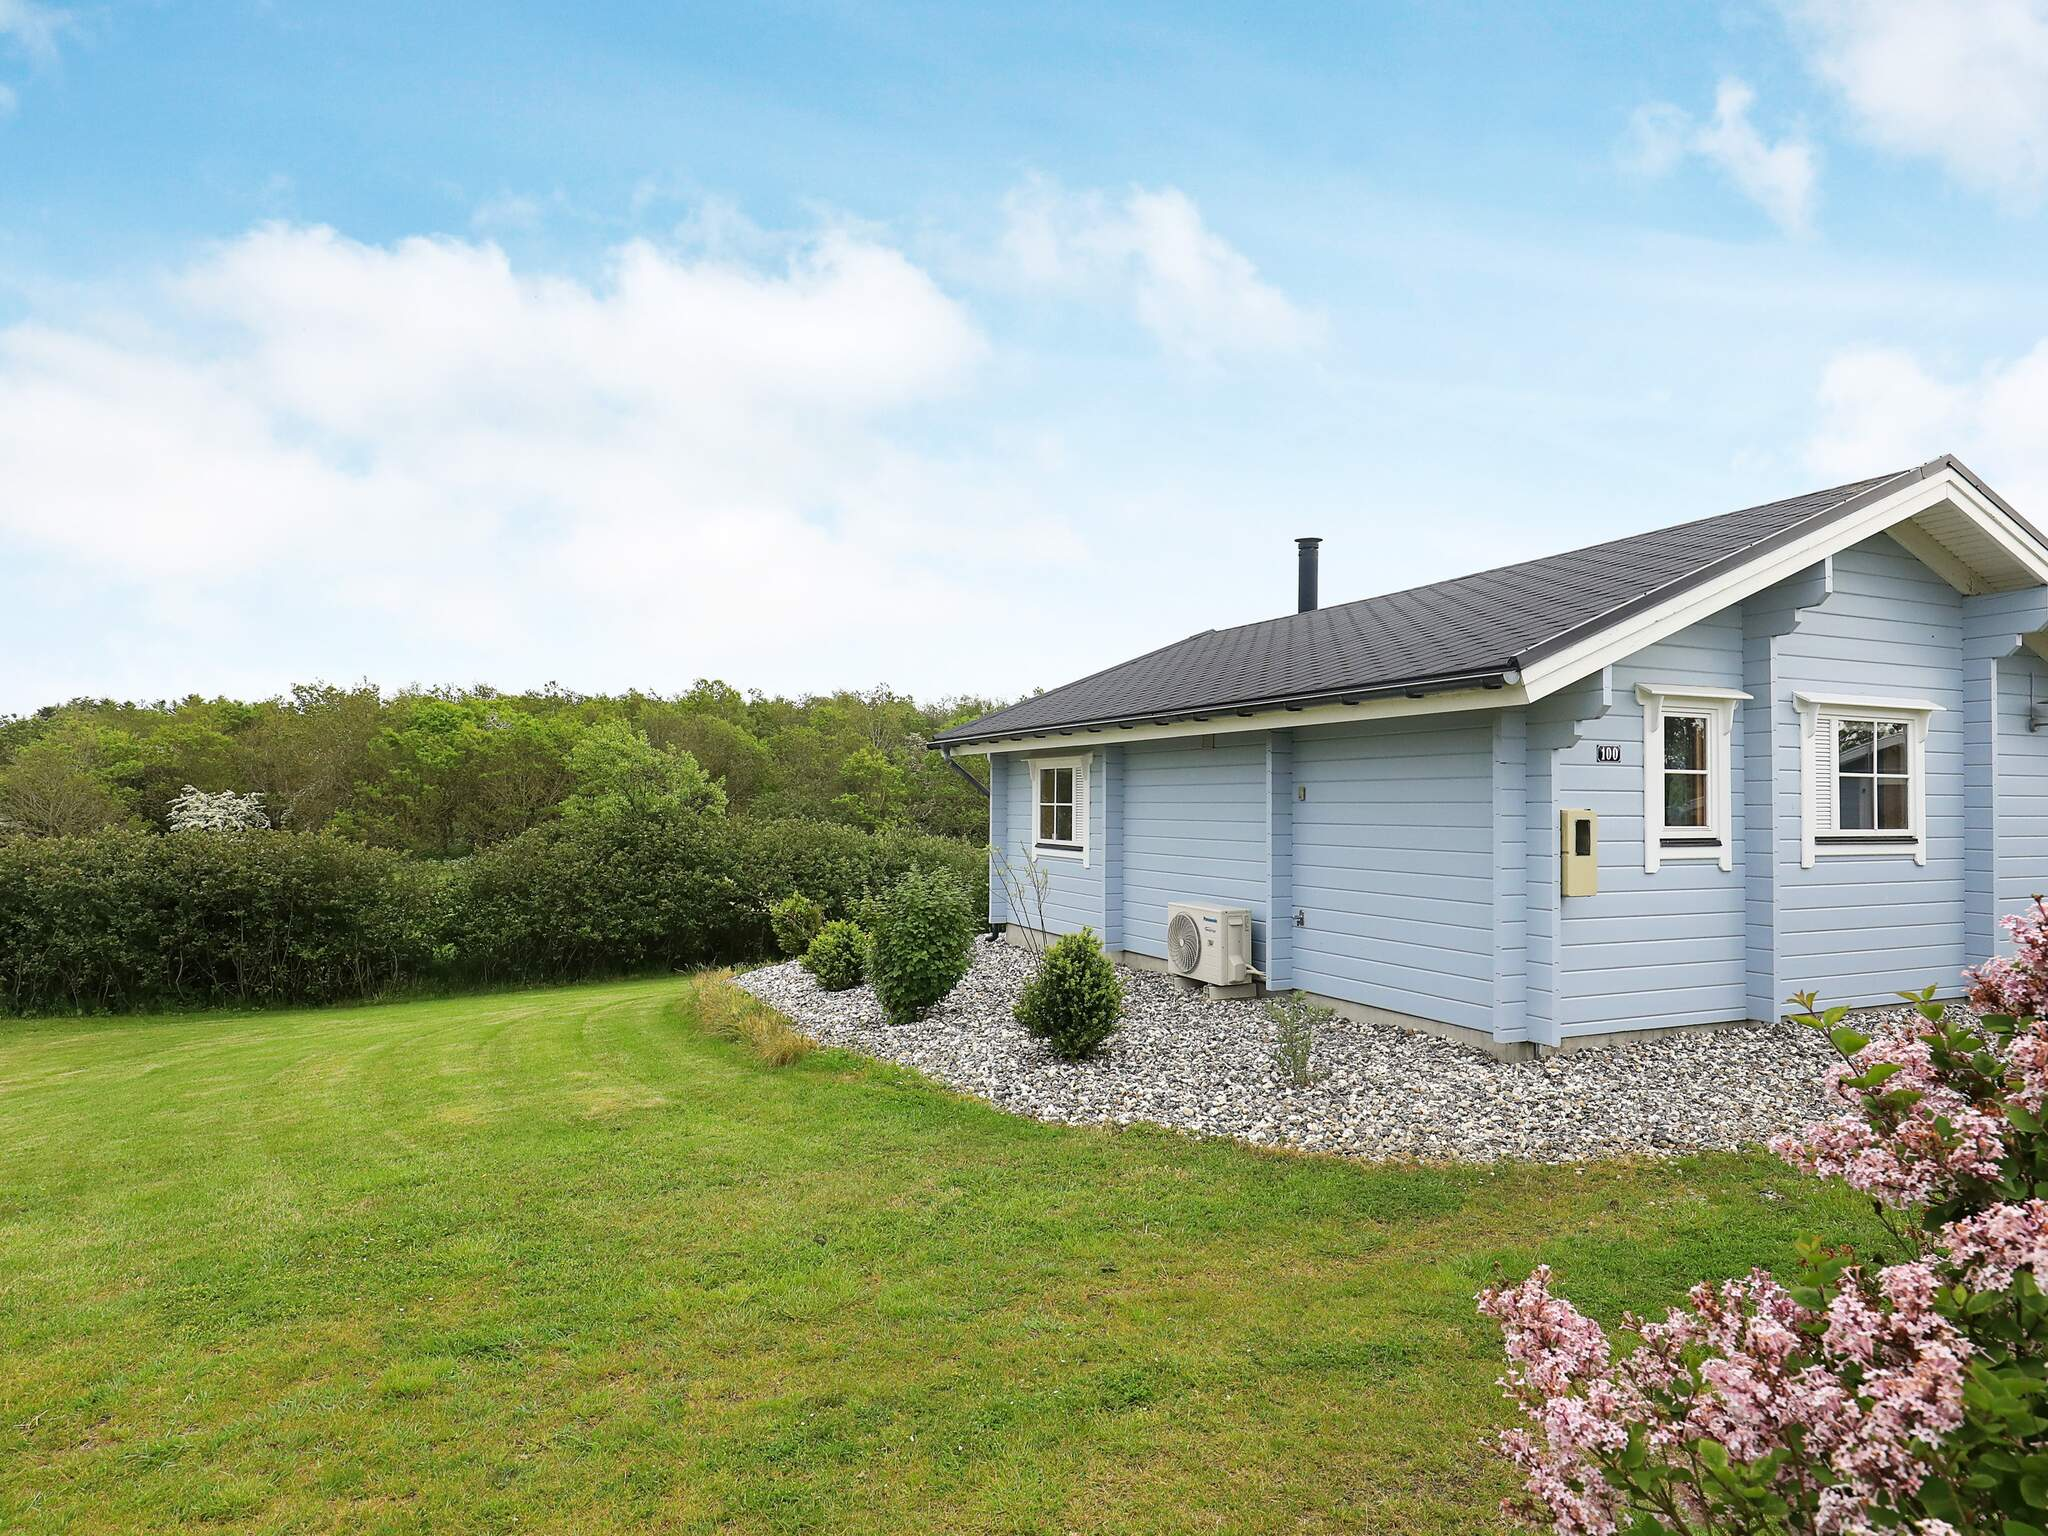 Maison de vacances Eskov Strandpark (603988), Roslev, , Limfjord, Danemark, image 12